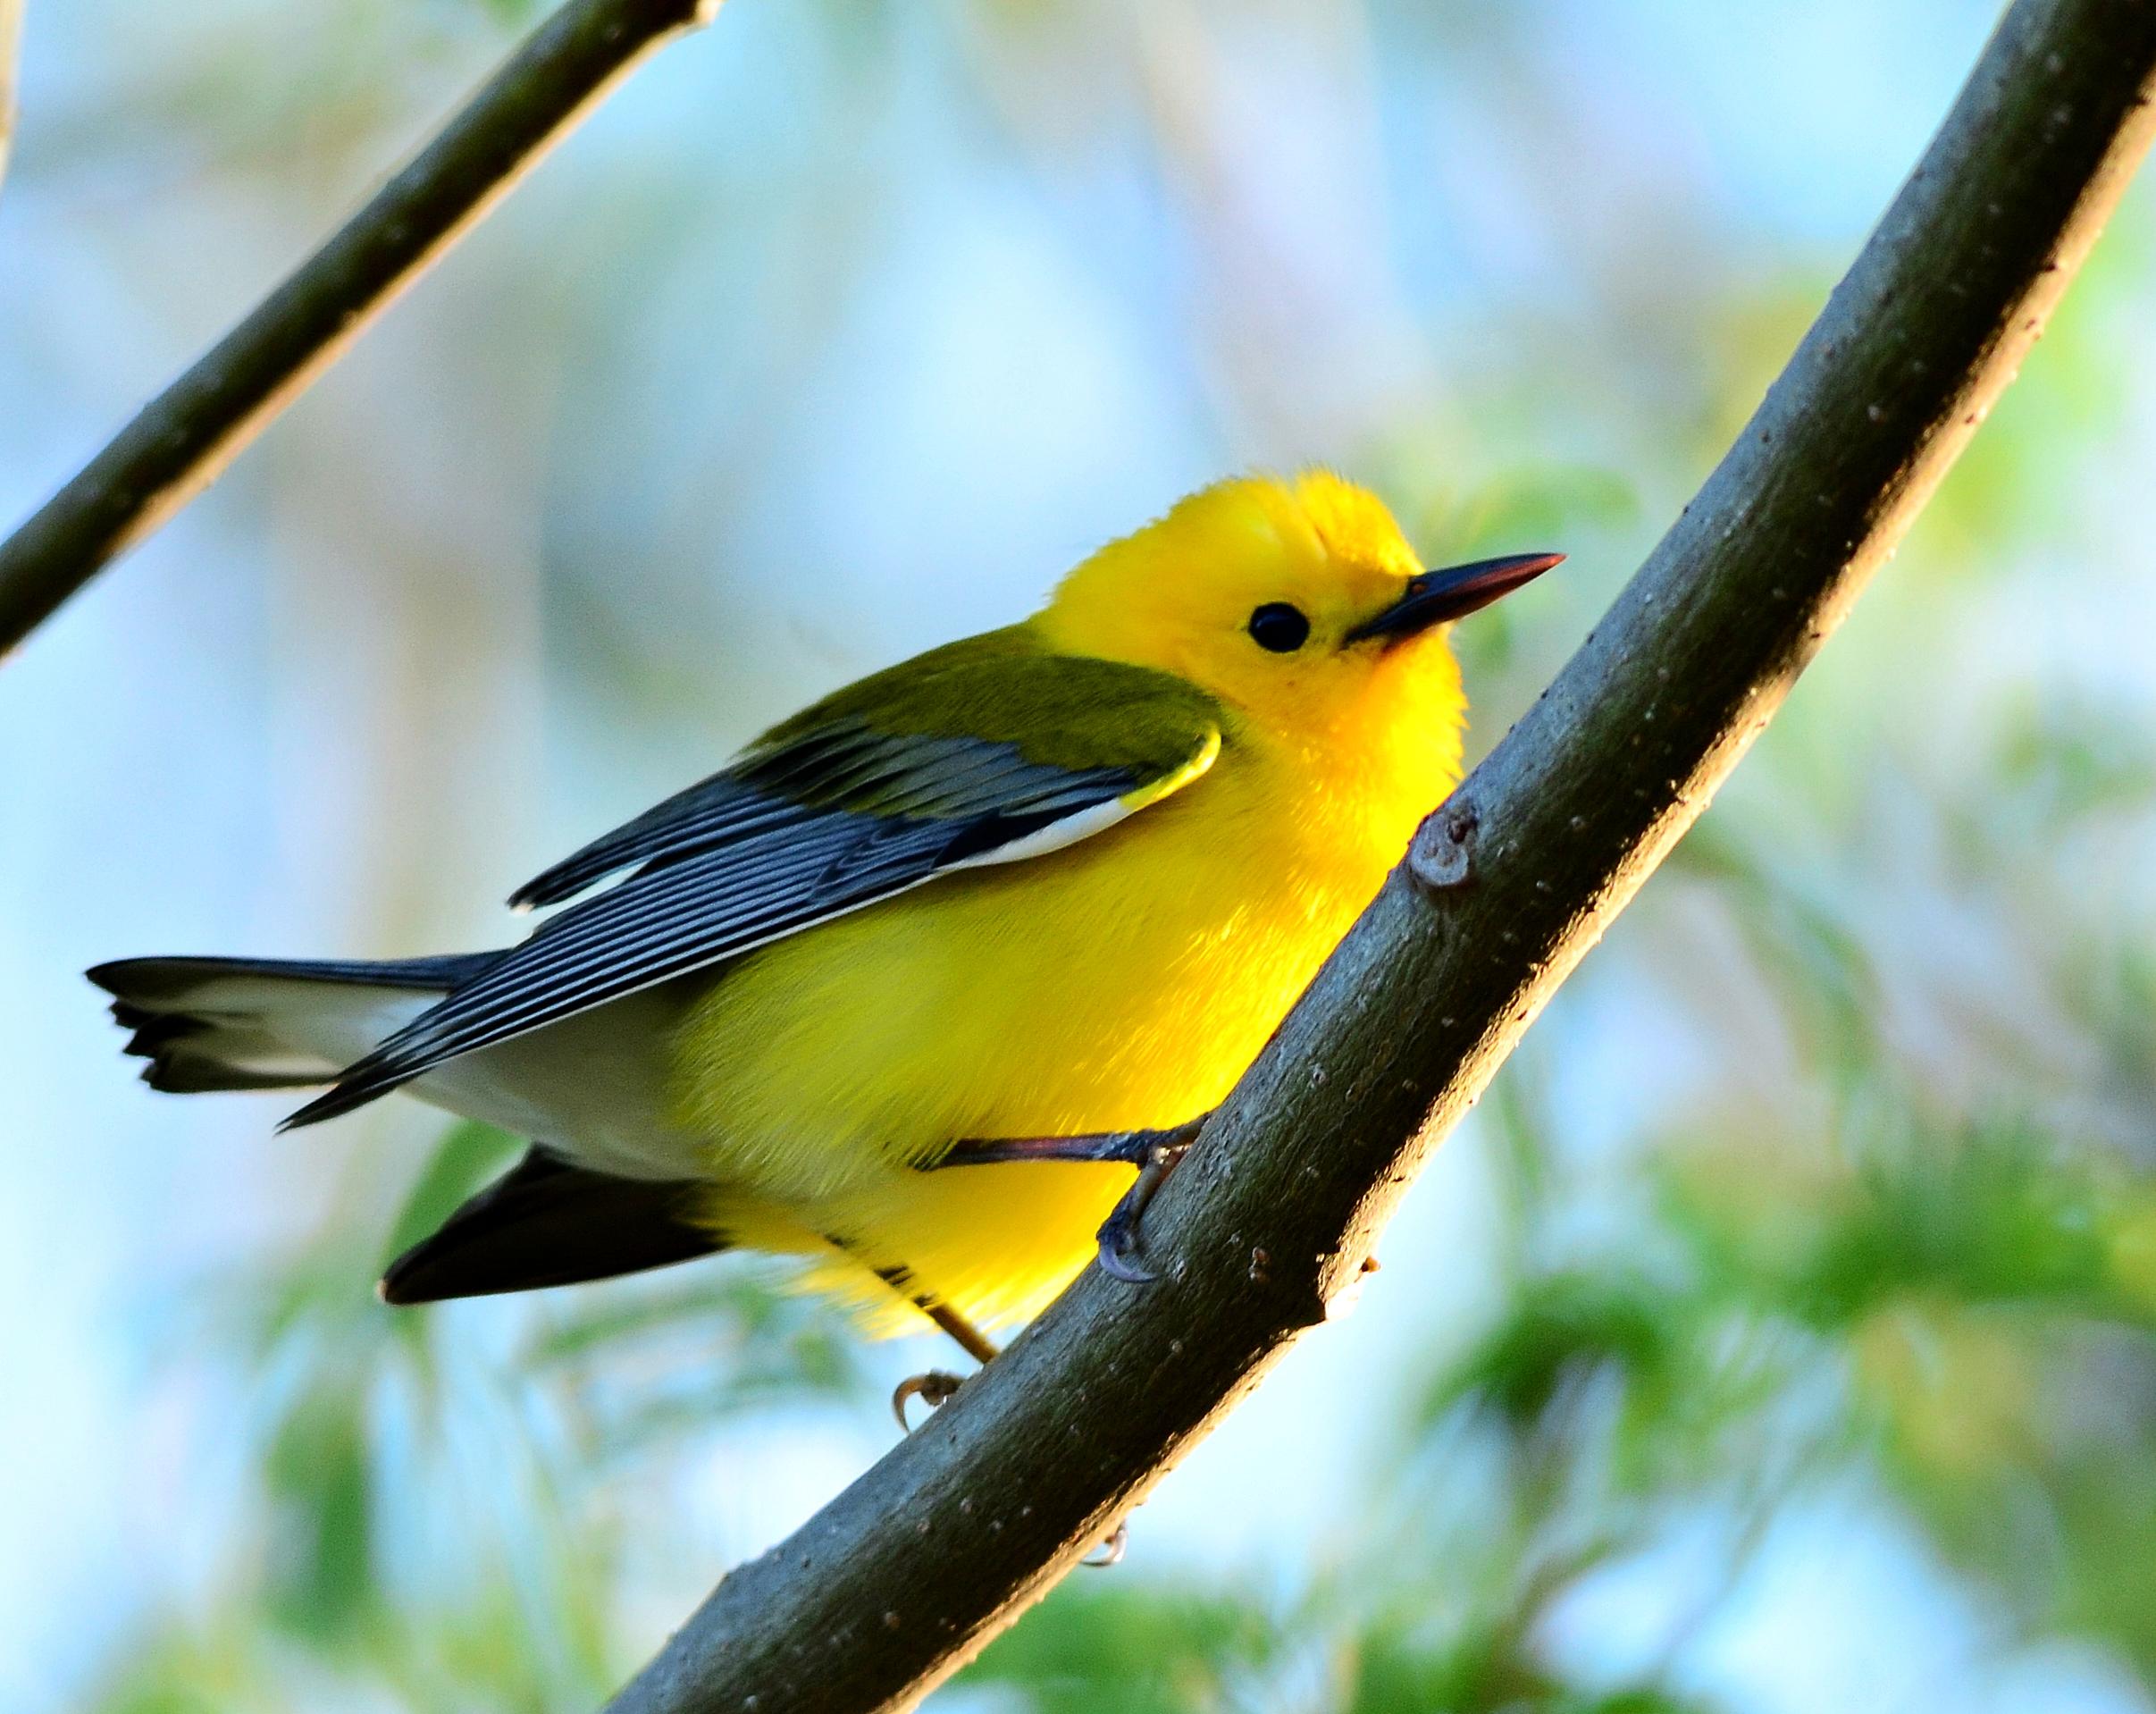 Little Yellow Bird >> Little Yellow Birds Invade Fort Desoto Dina S Wildlife Adventures